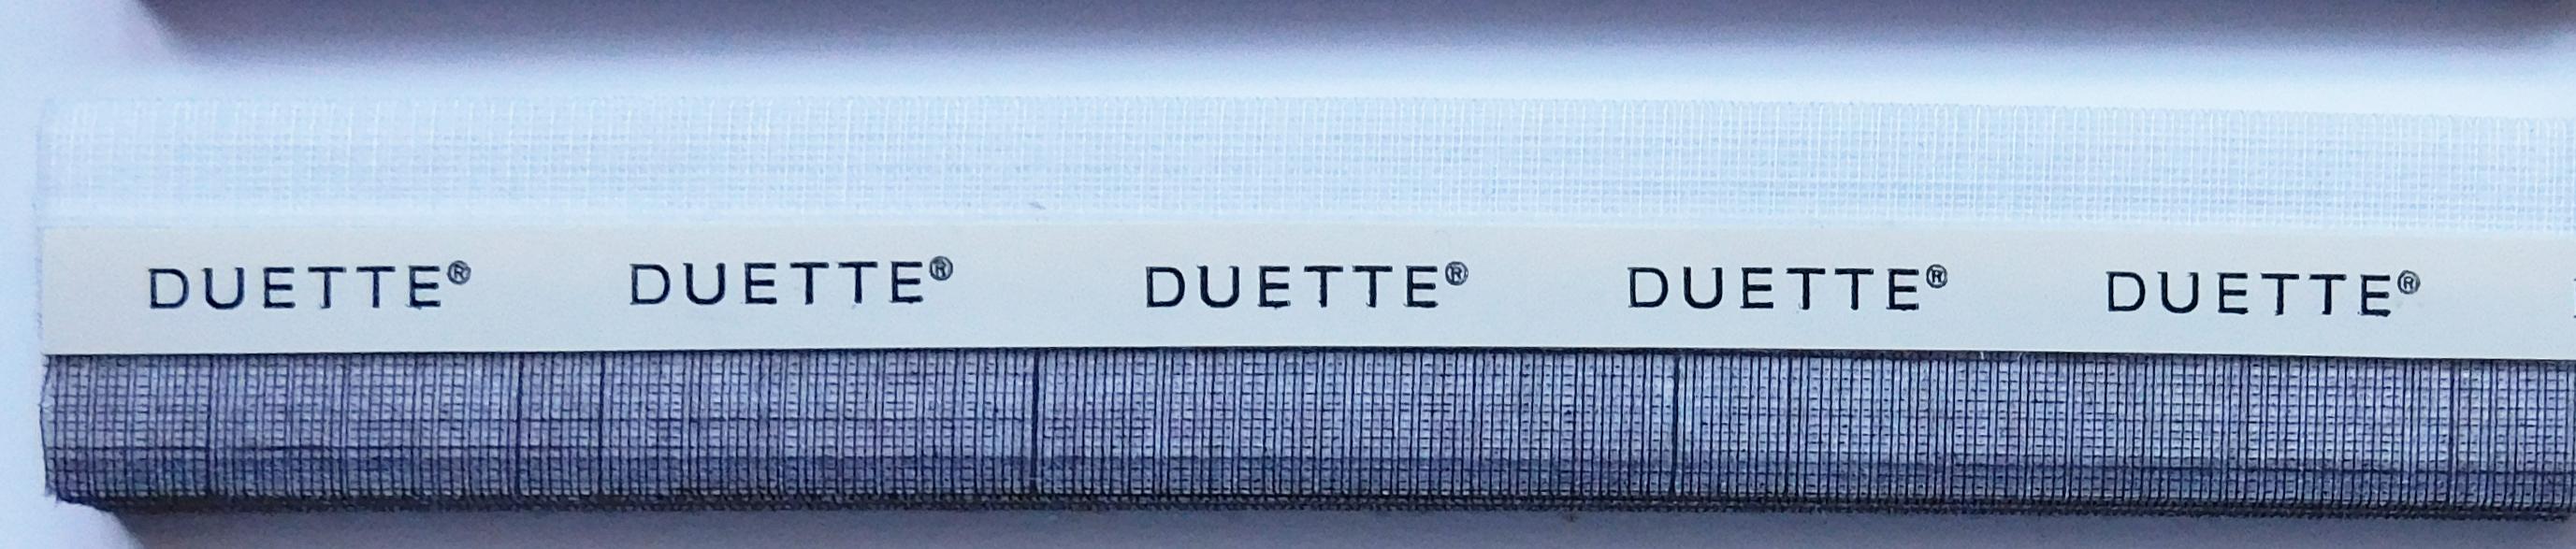 Batiste Chocolat Duette Blind Sample Fabric